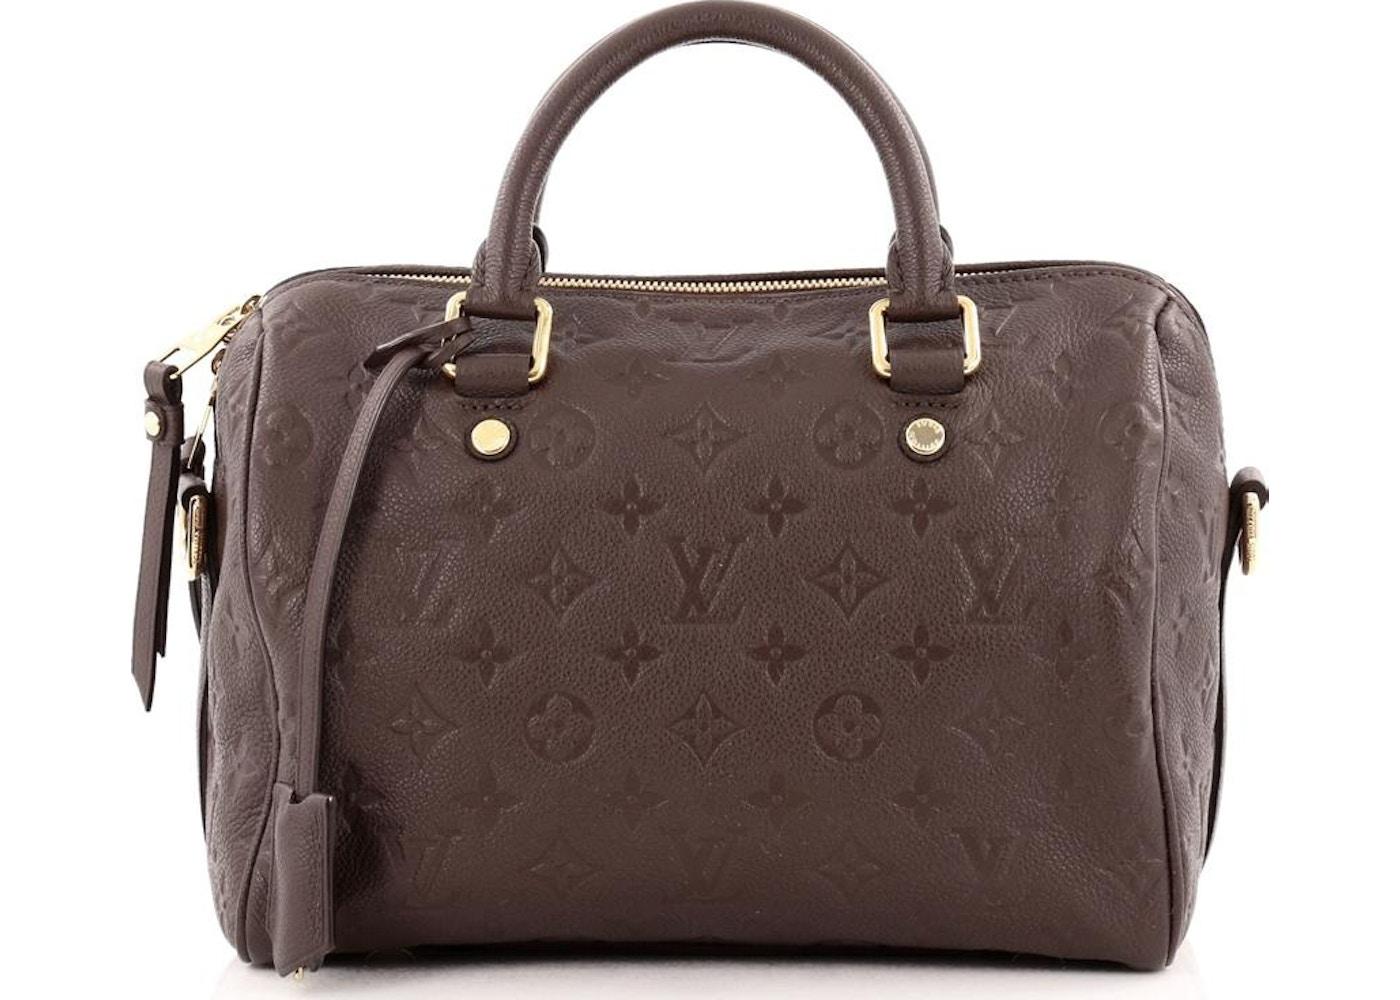 582c5e84f158 Louis Vuitton Speedy Bandouliere Monogram Empreinte 25 Terre Brown